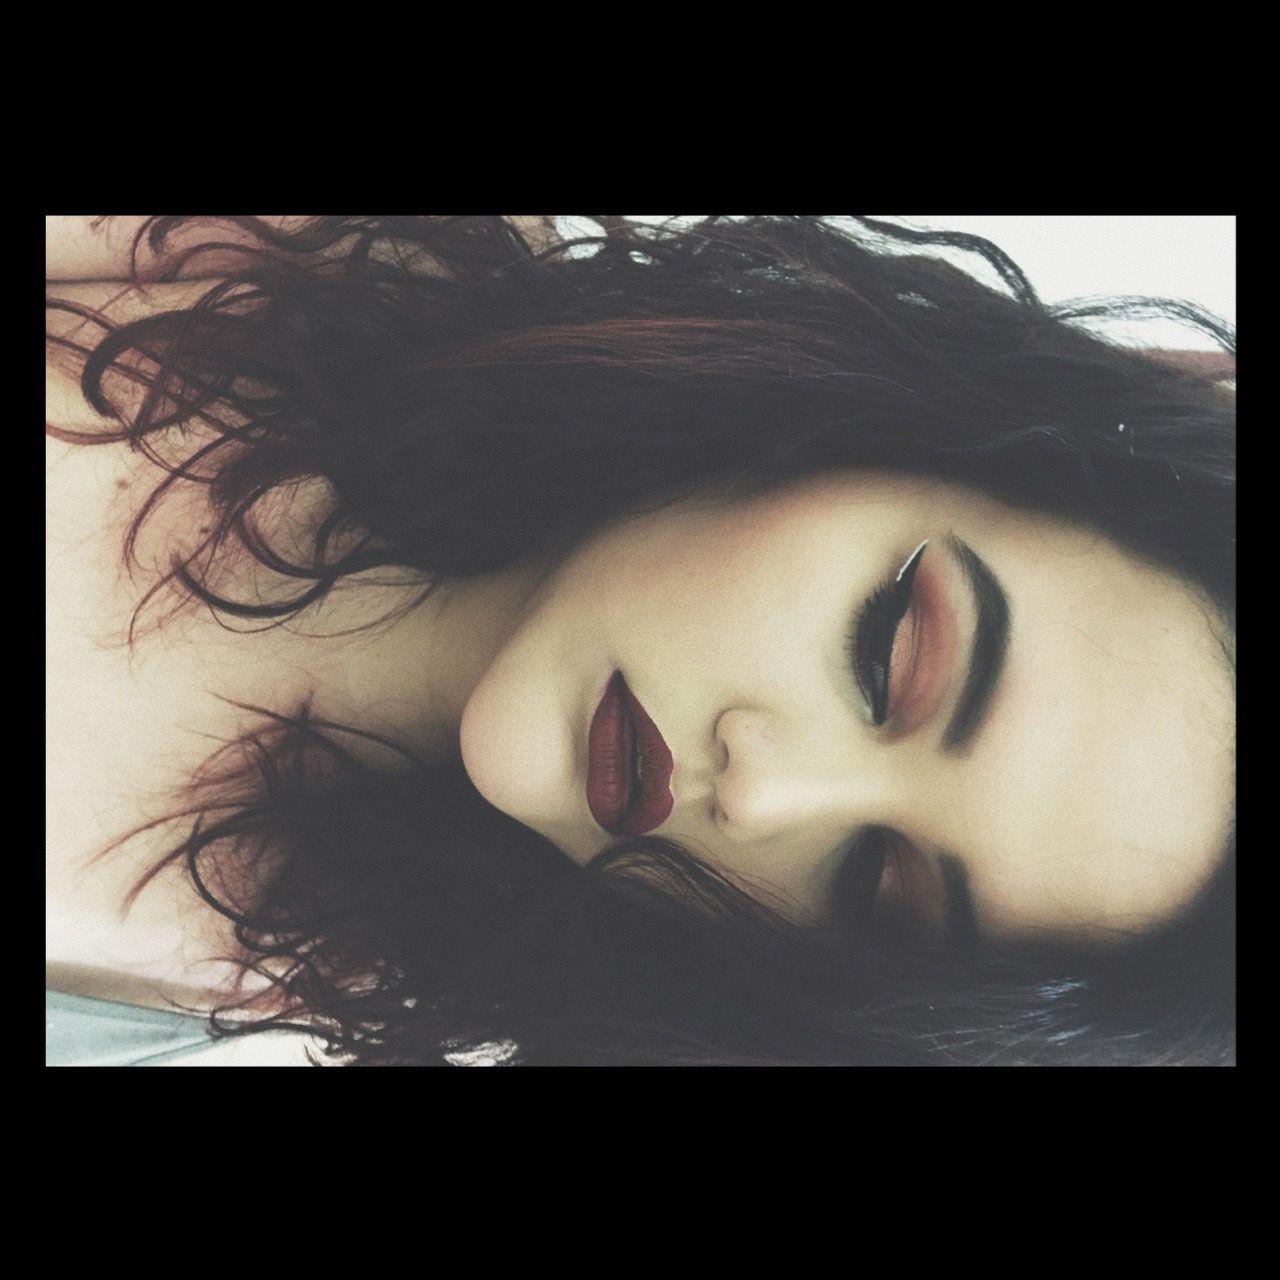 #35O palette #MorpheBrushes So fine liquid eyeliner #tarteCosmetics #unicornblood #velourliquidlipstick #jeffreeStar